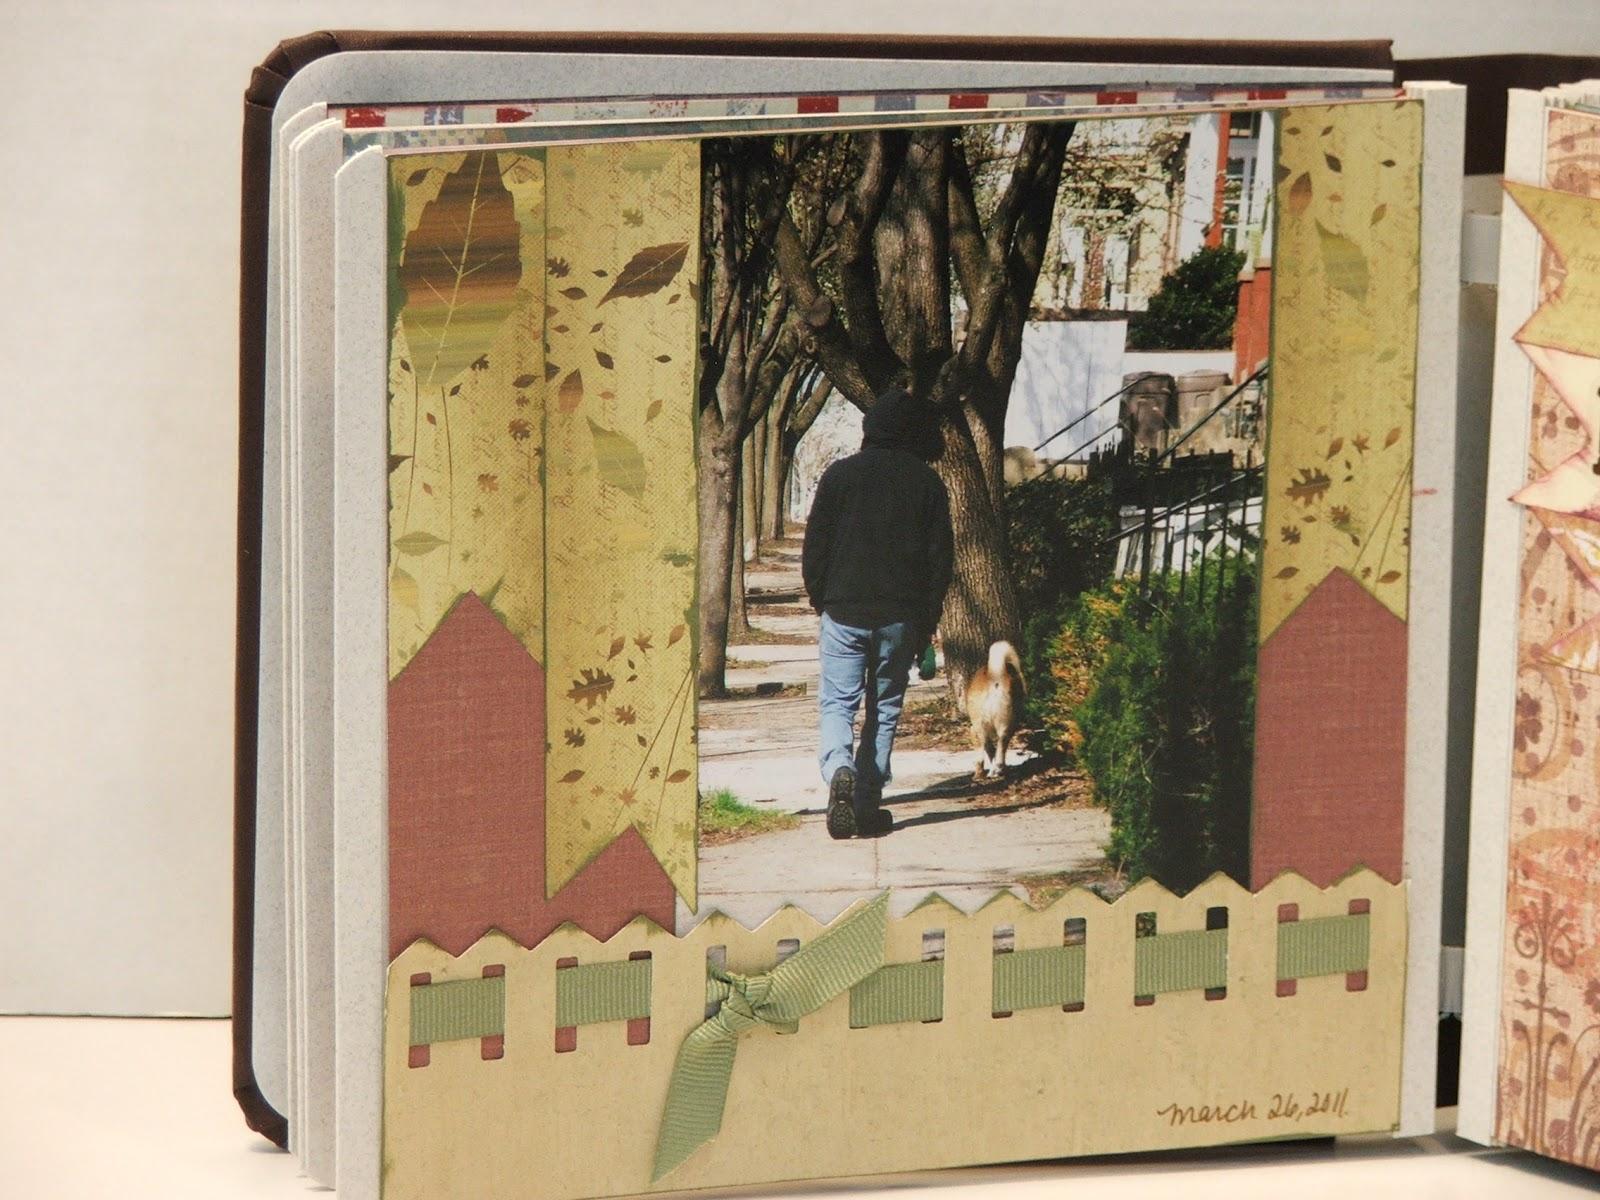 Scrapbook ideas creative memories - Highlights From A Small Creative Memories Album Using Border Maker System